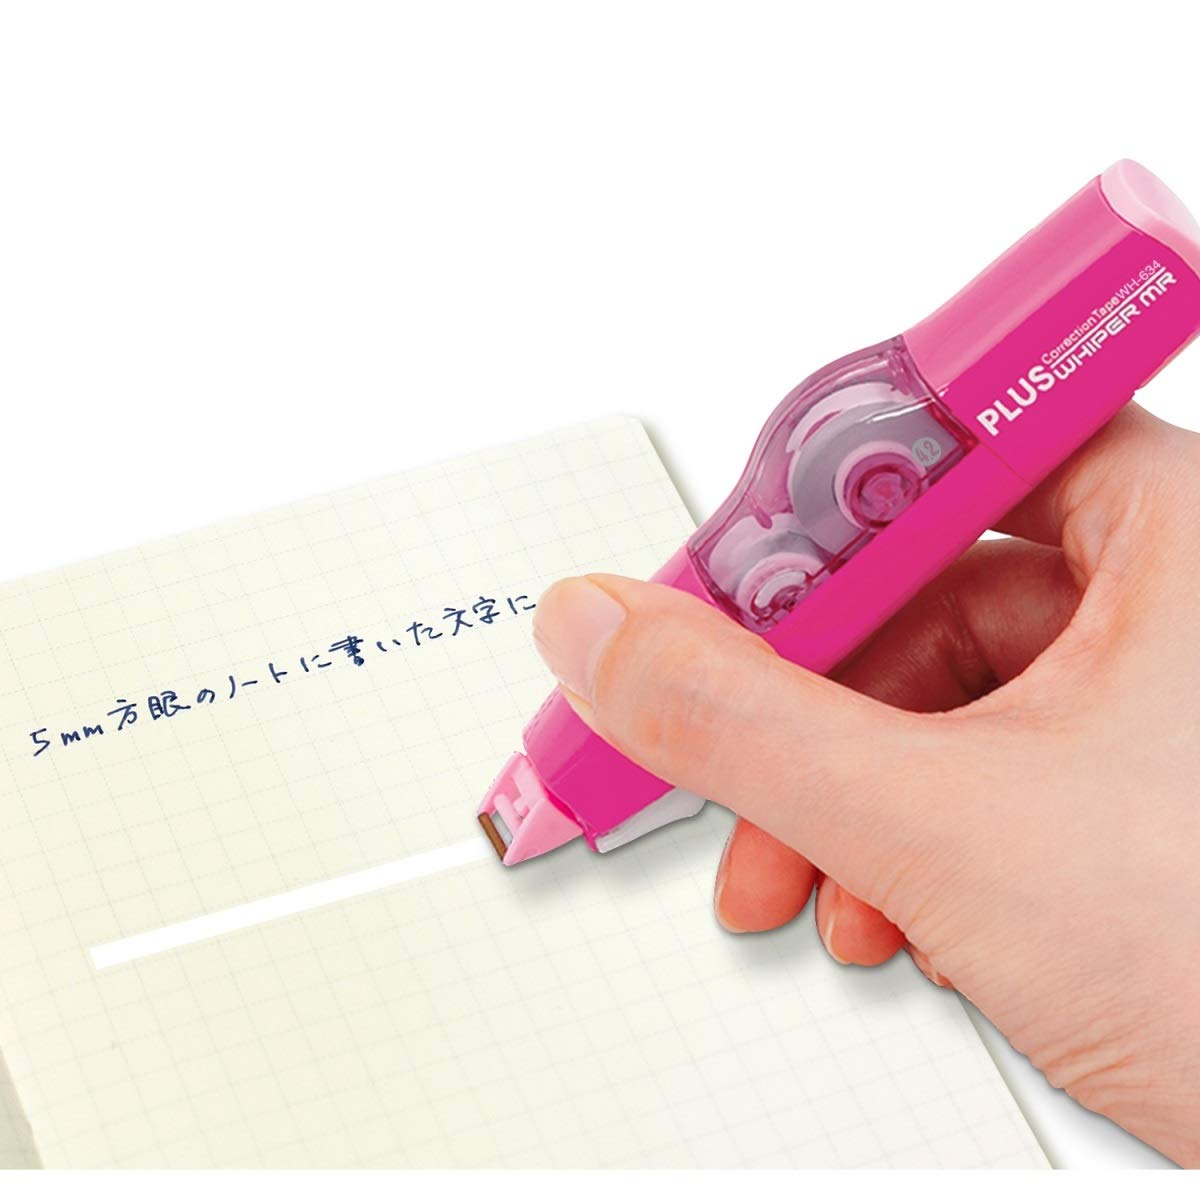 WH-634 PLUS Whiper MR /& refills 5 pcs Whiper Mini Roller Correction Tape 4.2mm x 6m